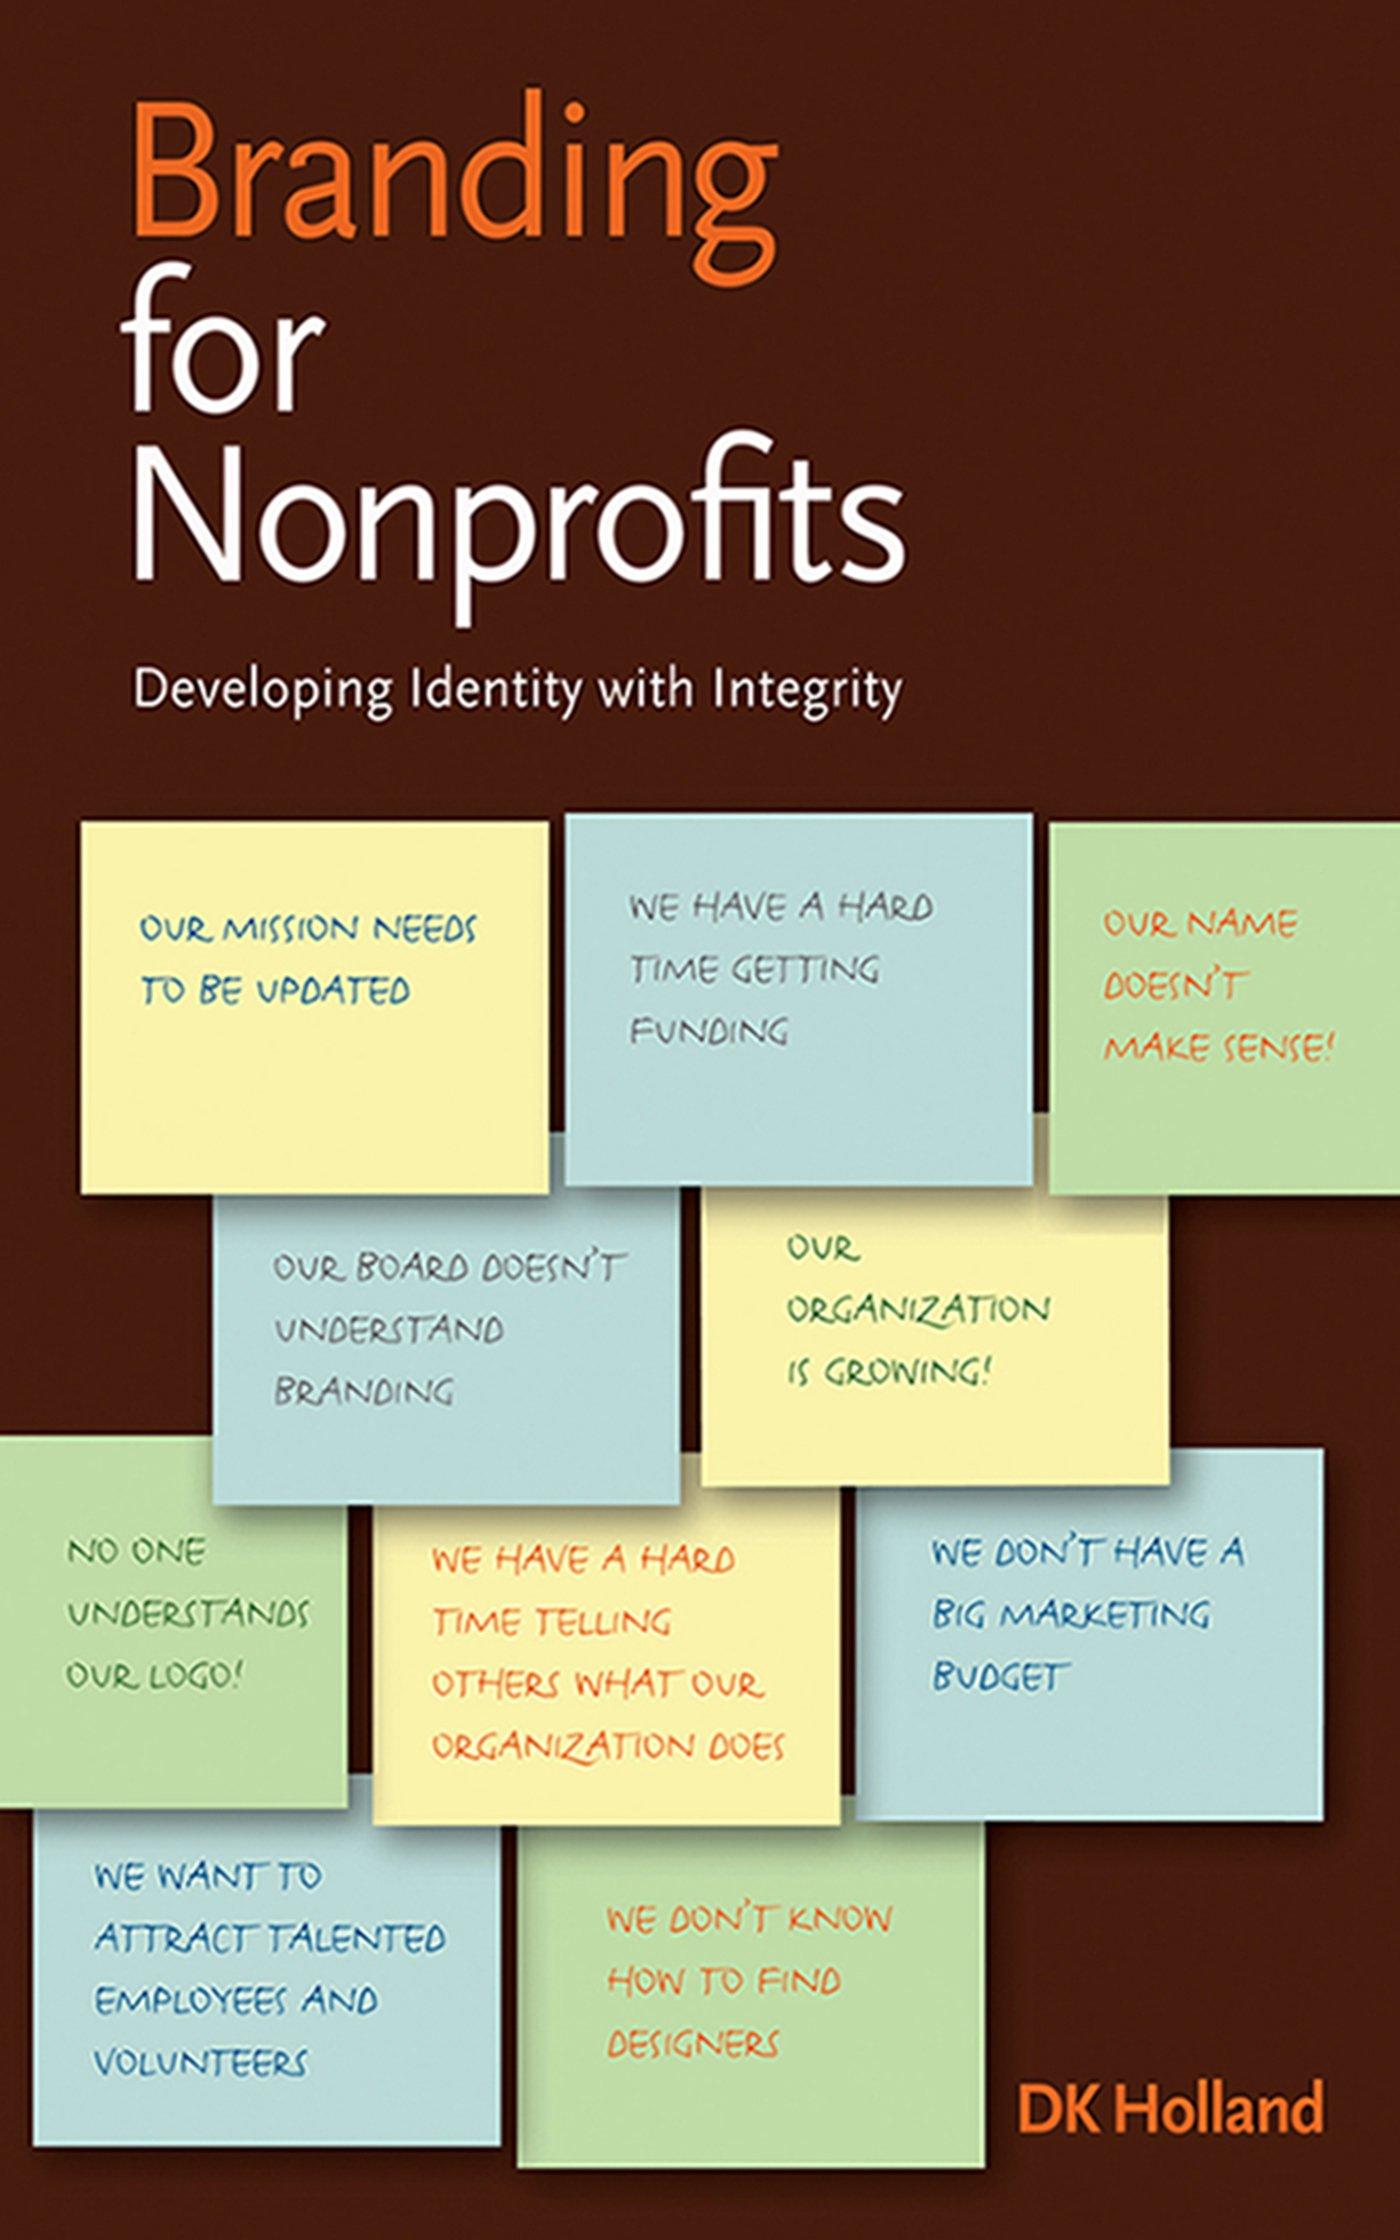 Branding Nonprofits DK Holland product image